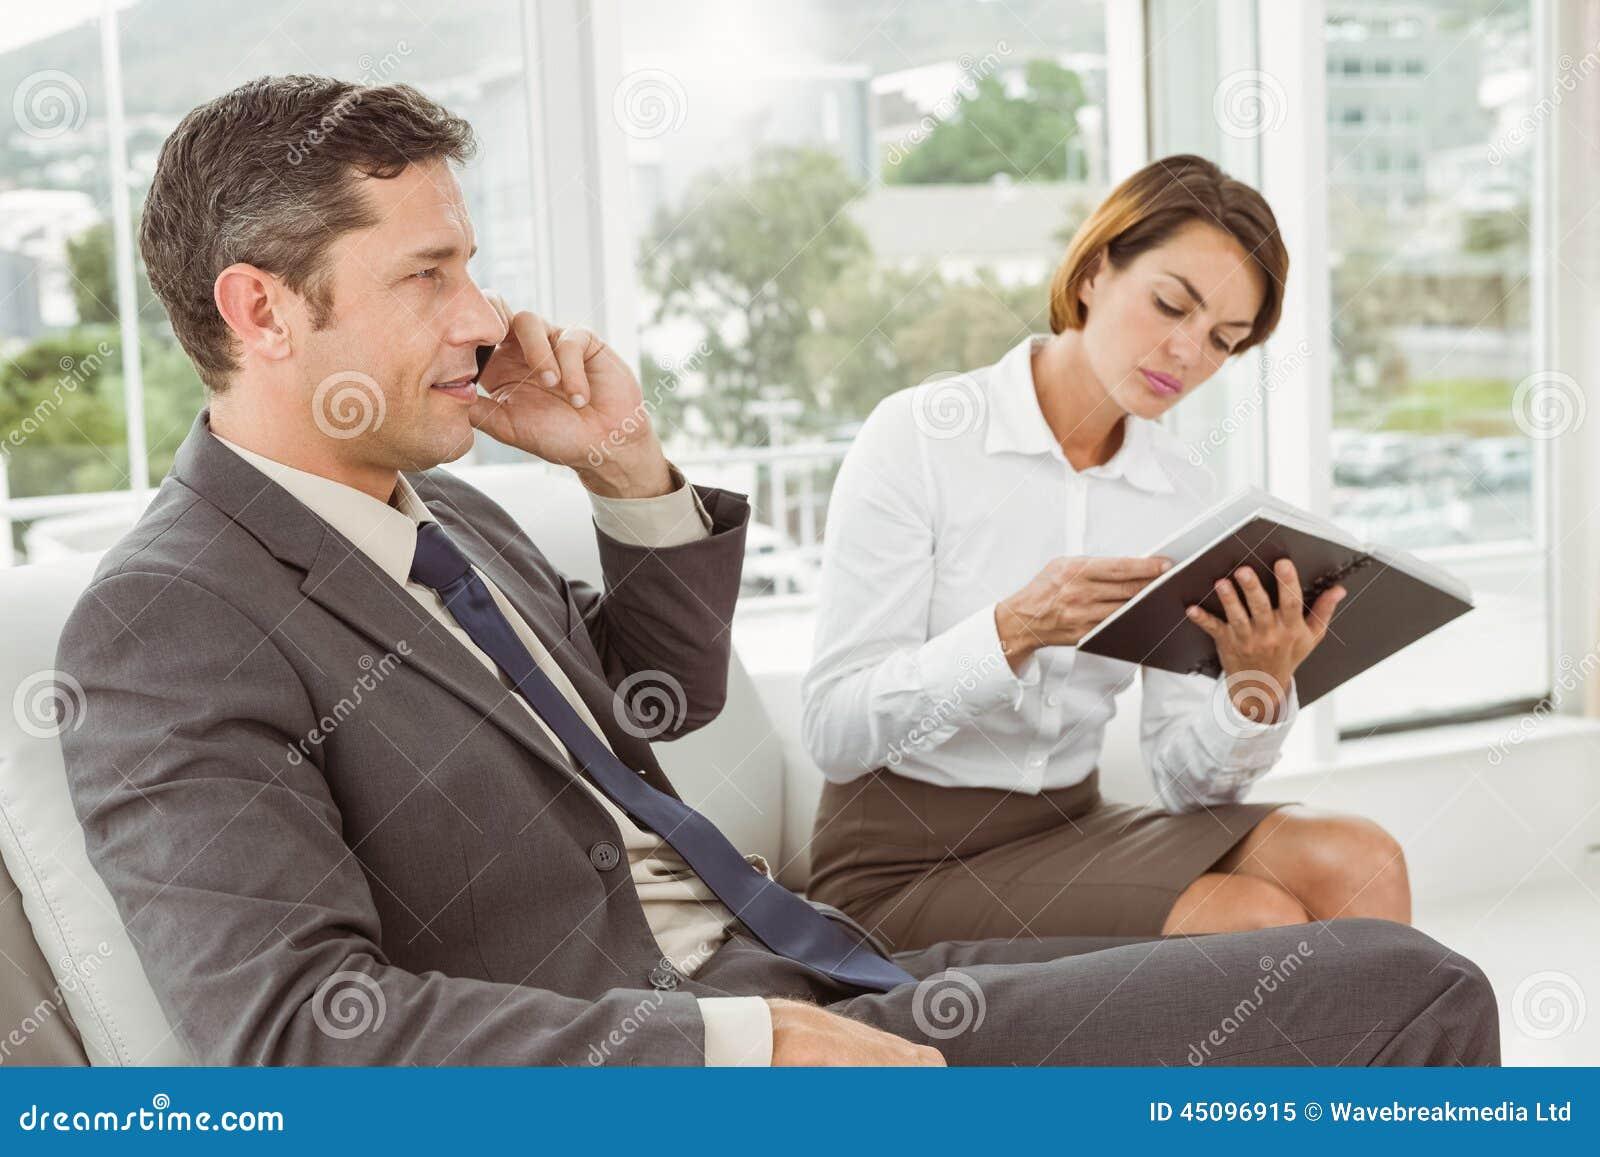 Businessman and his secretary